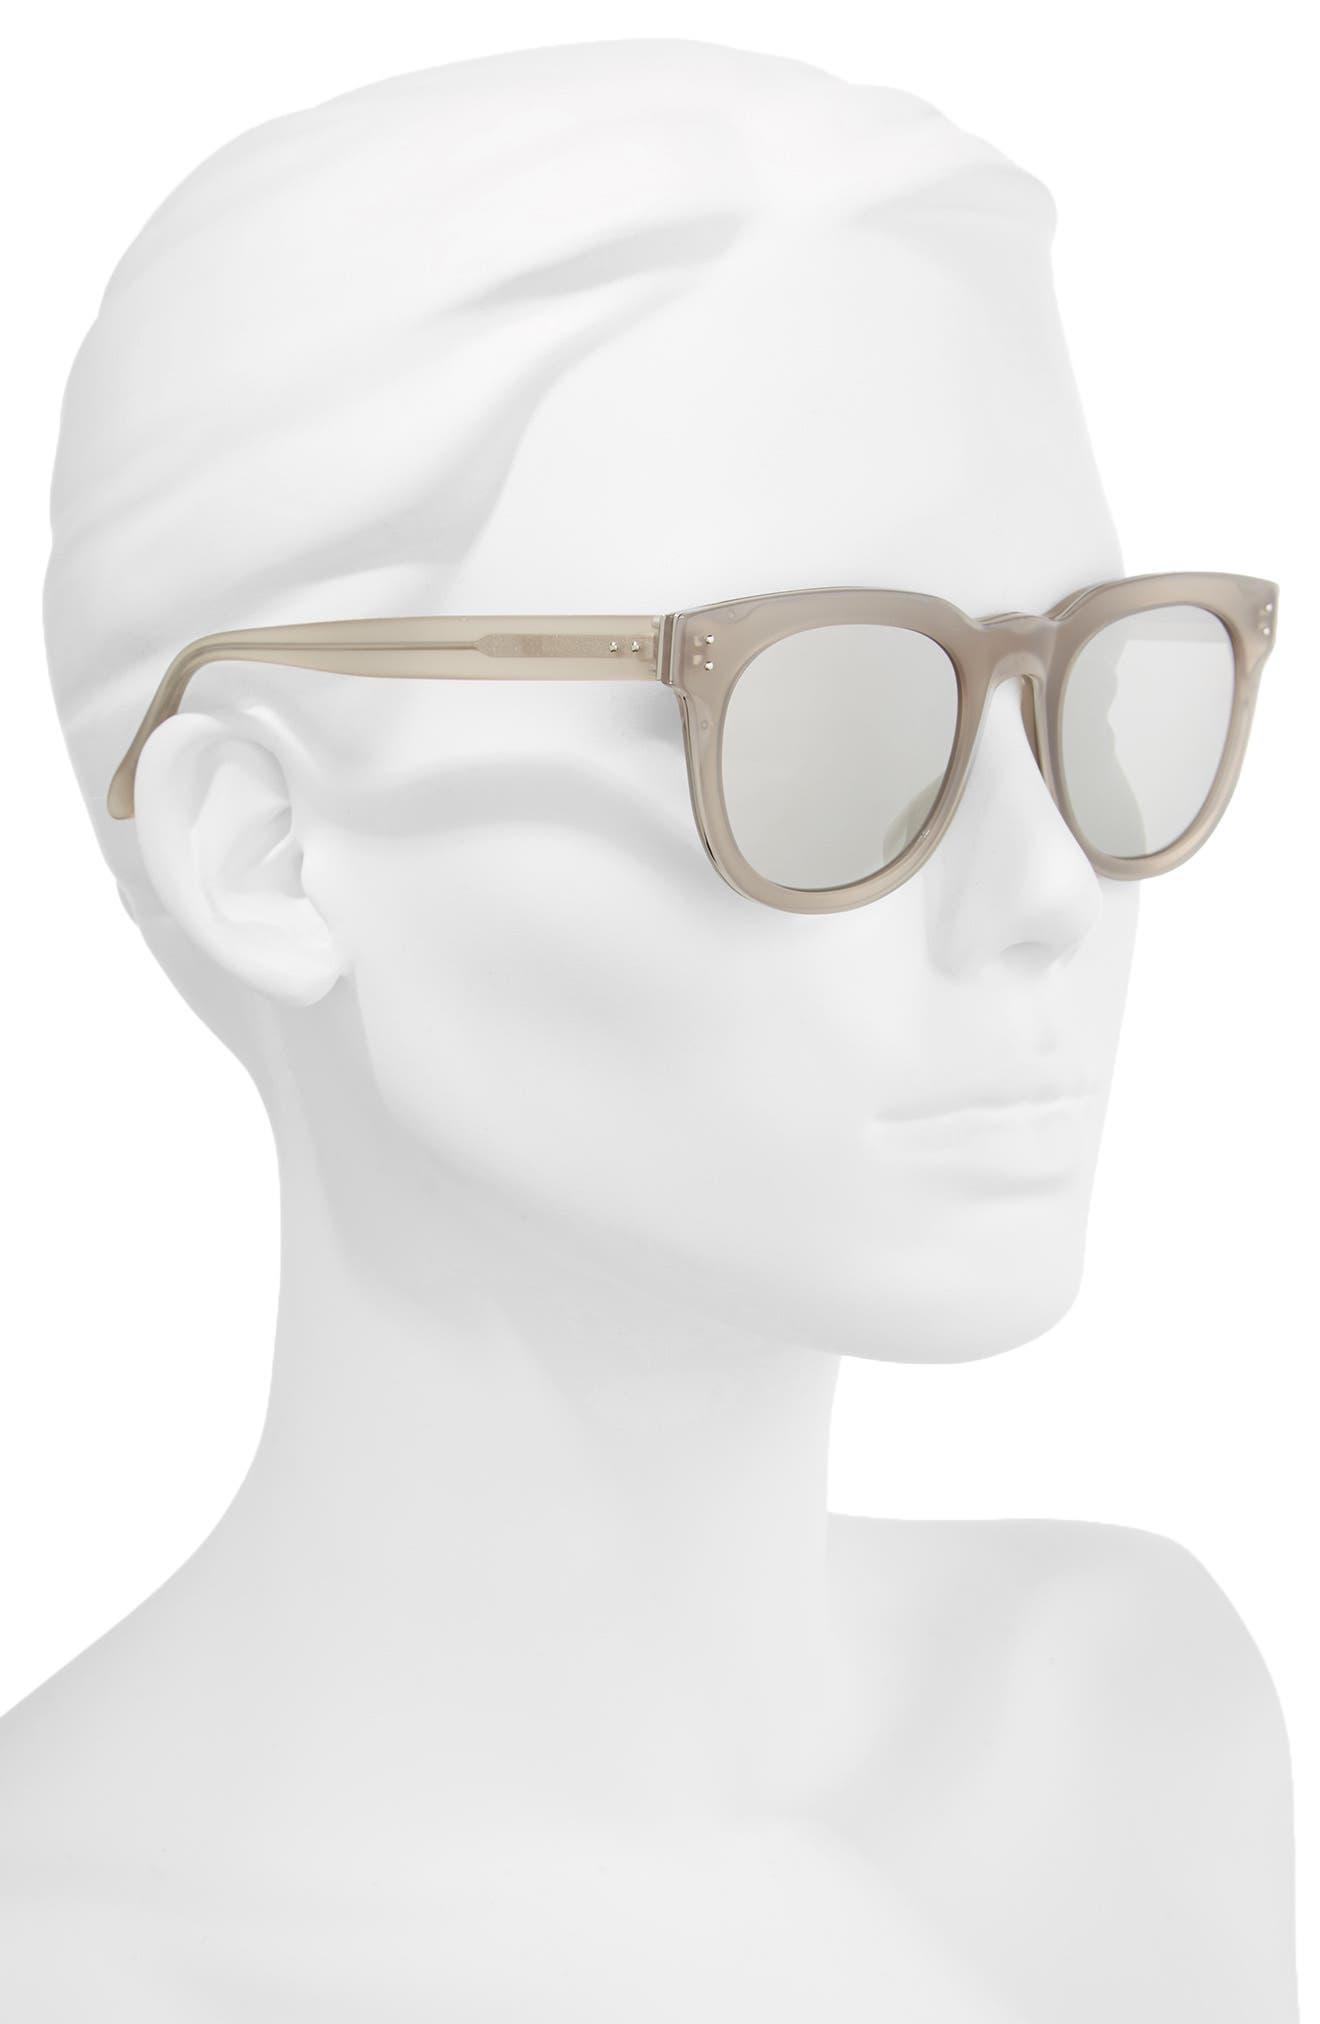 50mm D-Frame Mirrored Sunglasses,                             Alternate thumbnail 2, color,                             020